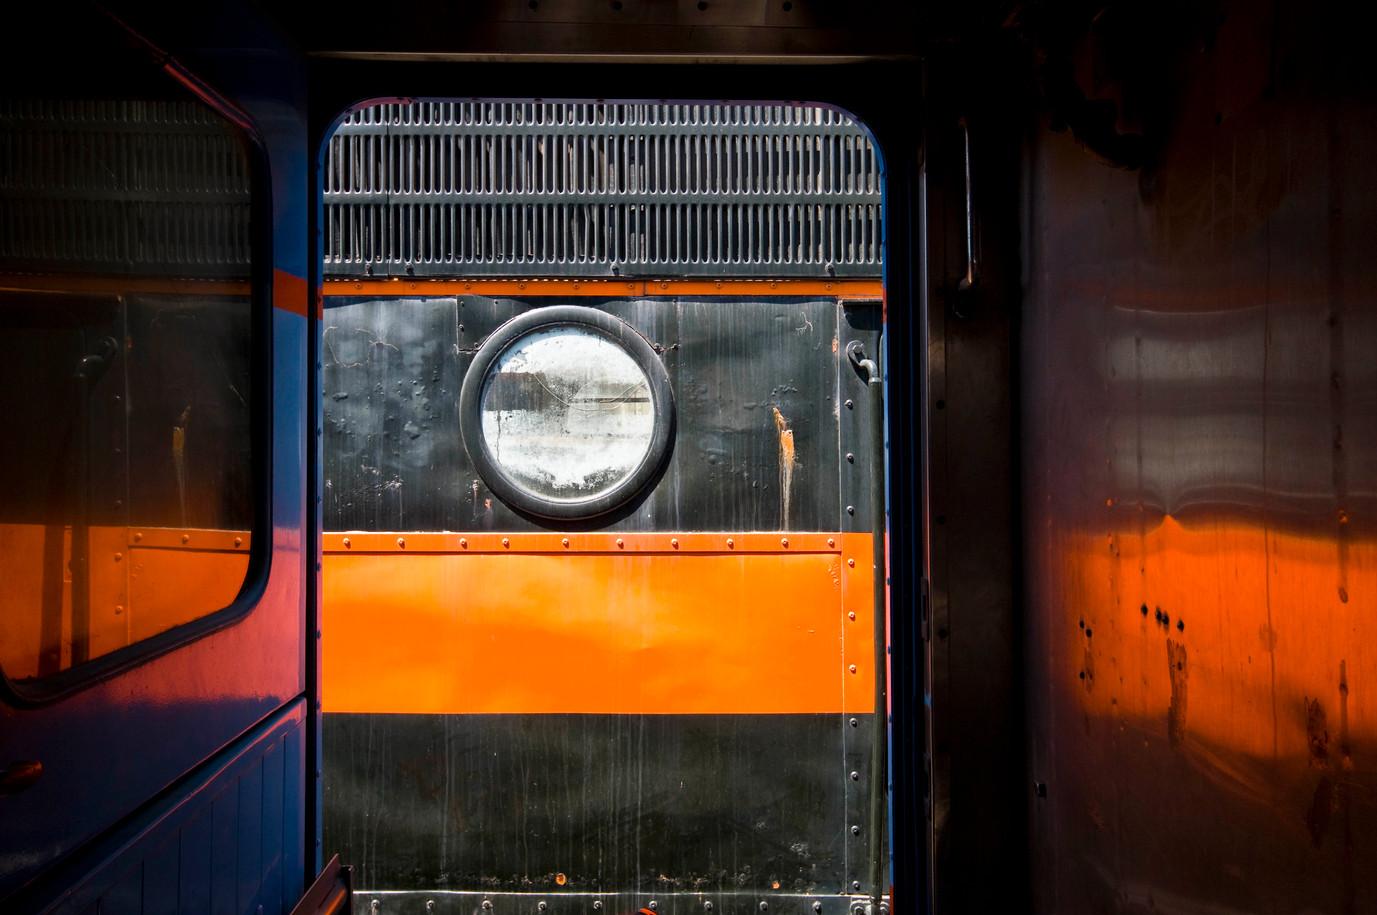 Rothko viaja en Tren